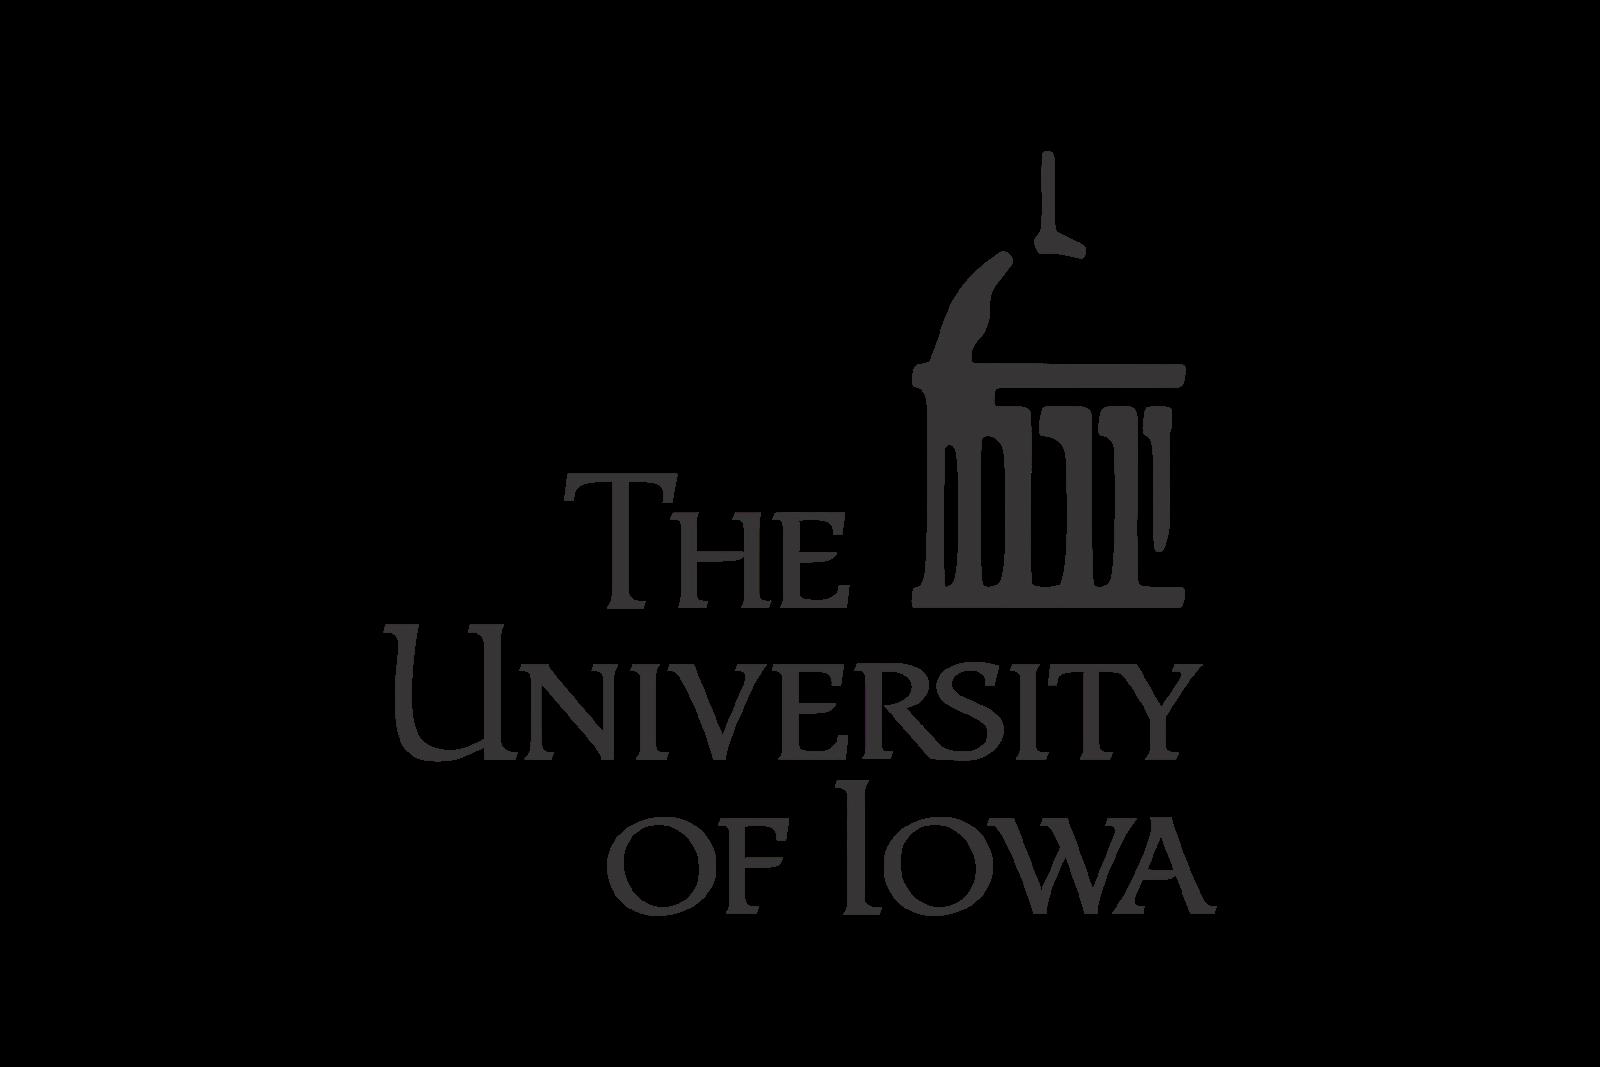 University Of Iowa Png - University Of Iowa Png Hdpng.com 1600, Transparent background PNG HD thumbnail